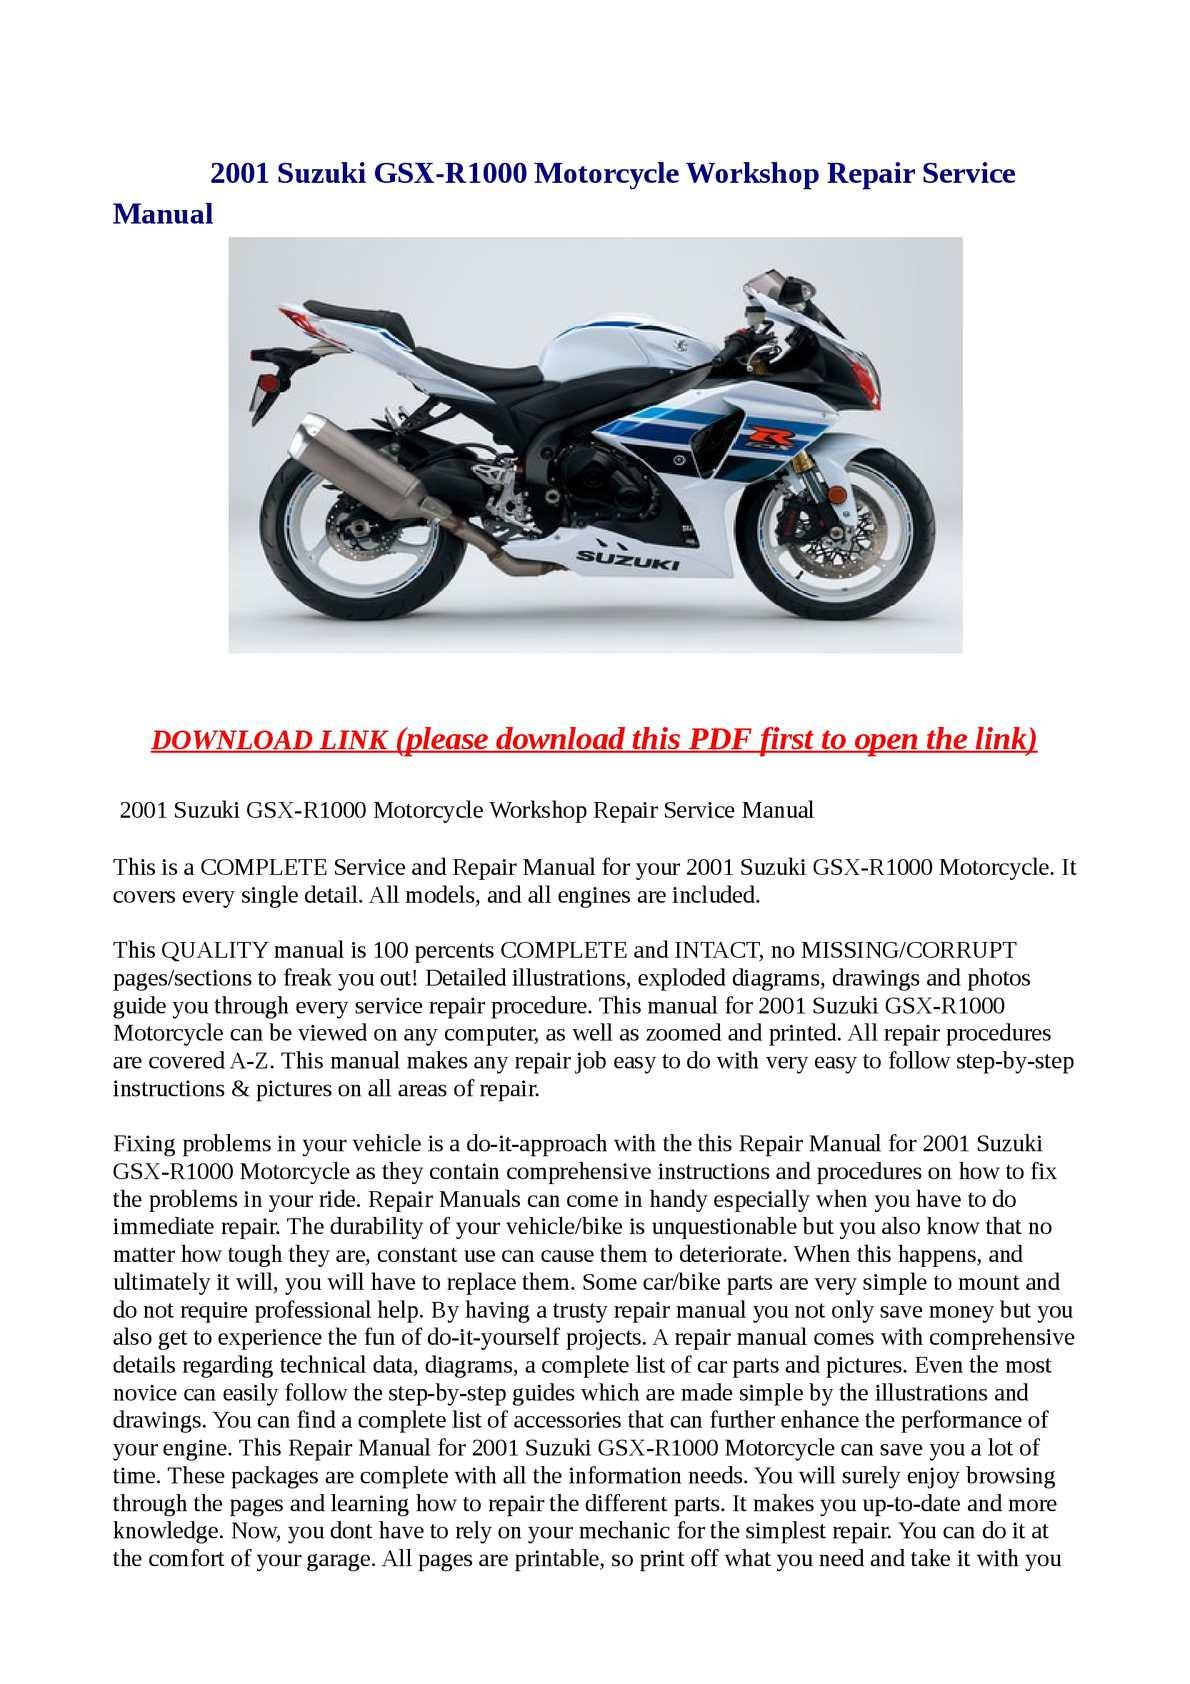 Calaméo - 2001 Suzuki GSX-R1000 Motorcycle Workshop Repair Service Manual